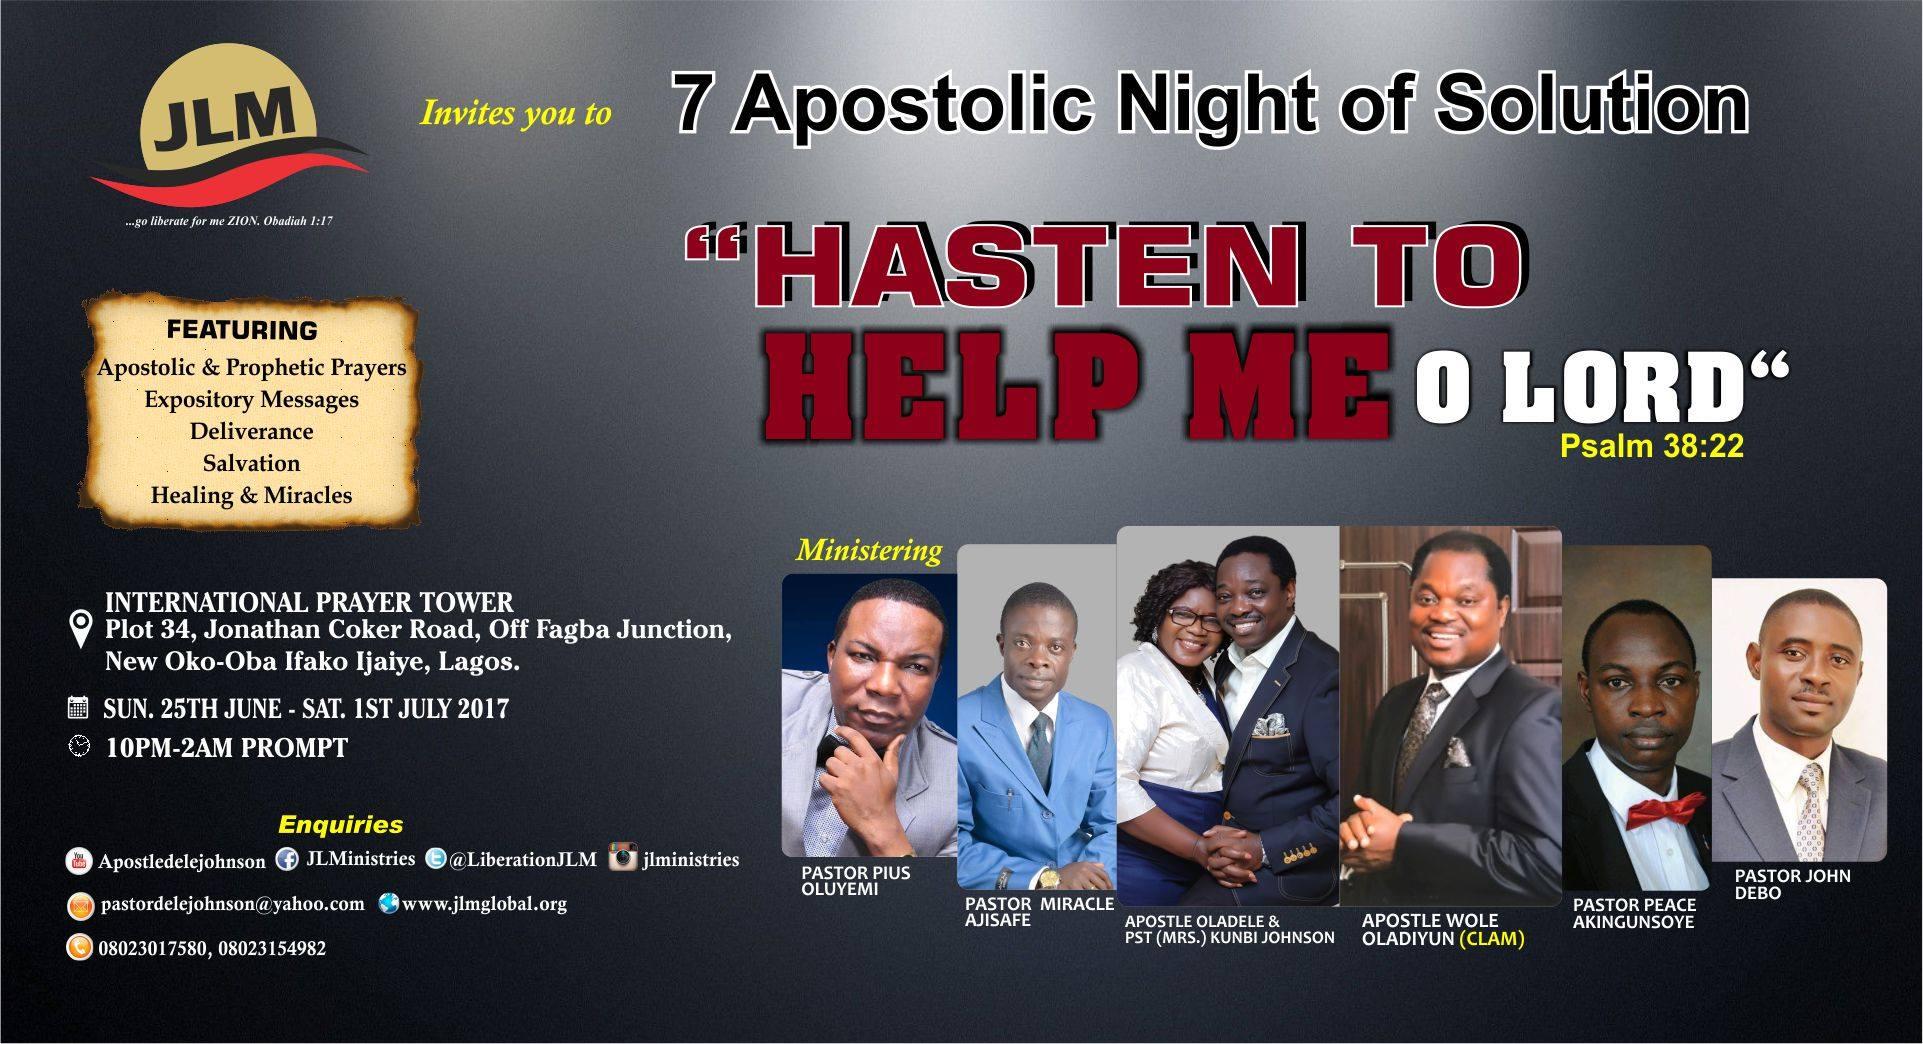 7 Apostolic Night of Solution